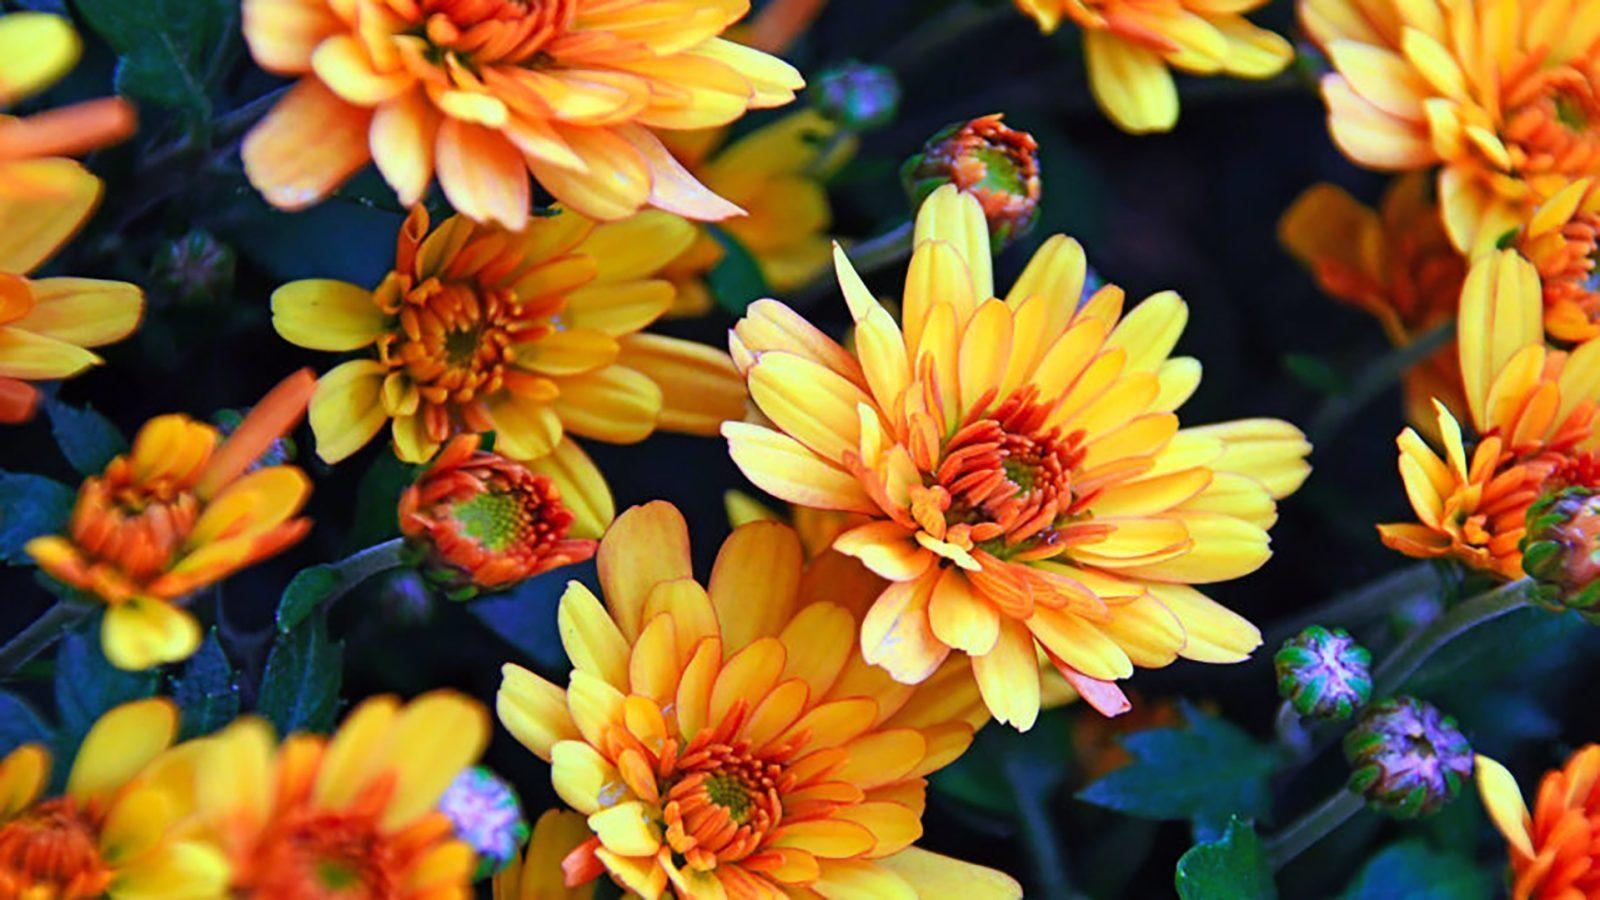 Flowers 4k Wallpapers For Desktop Mobiles